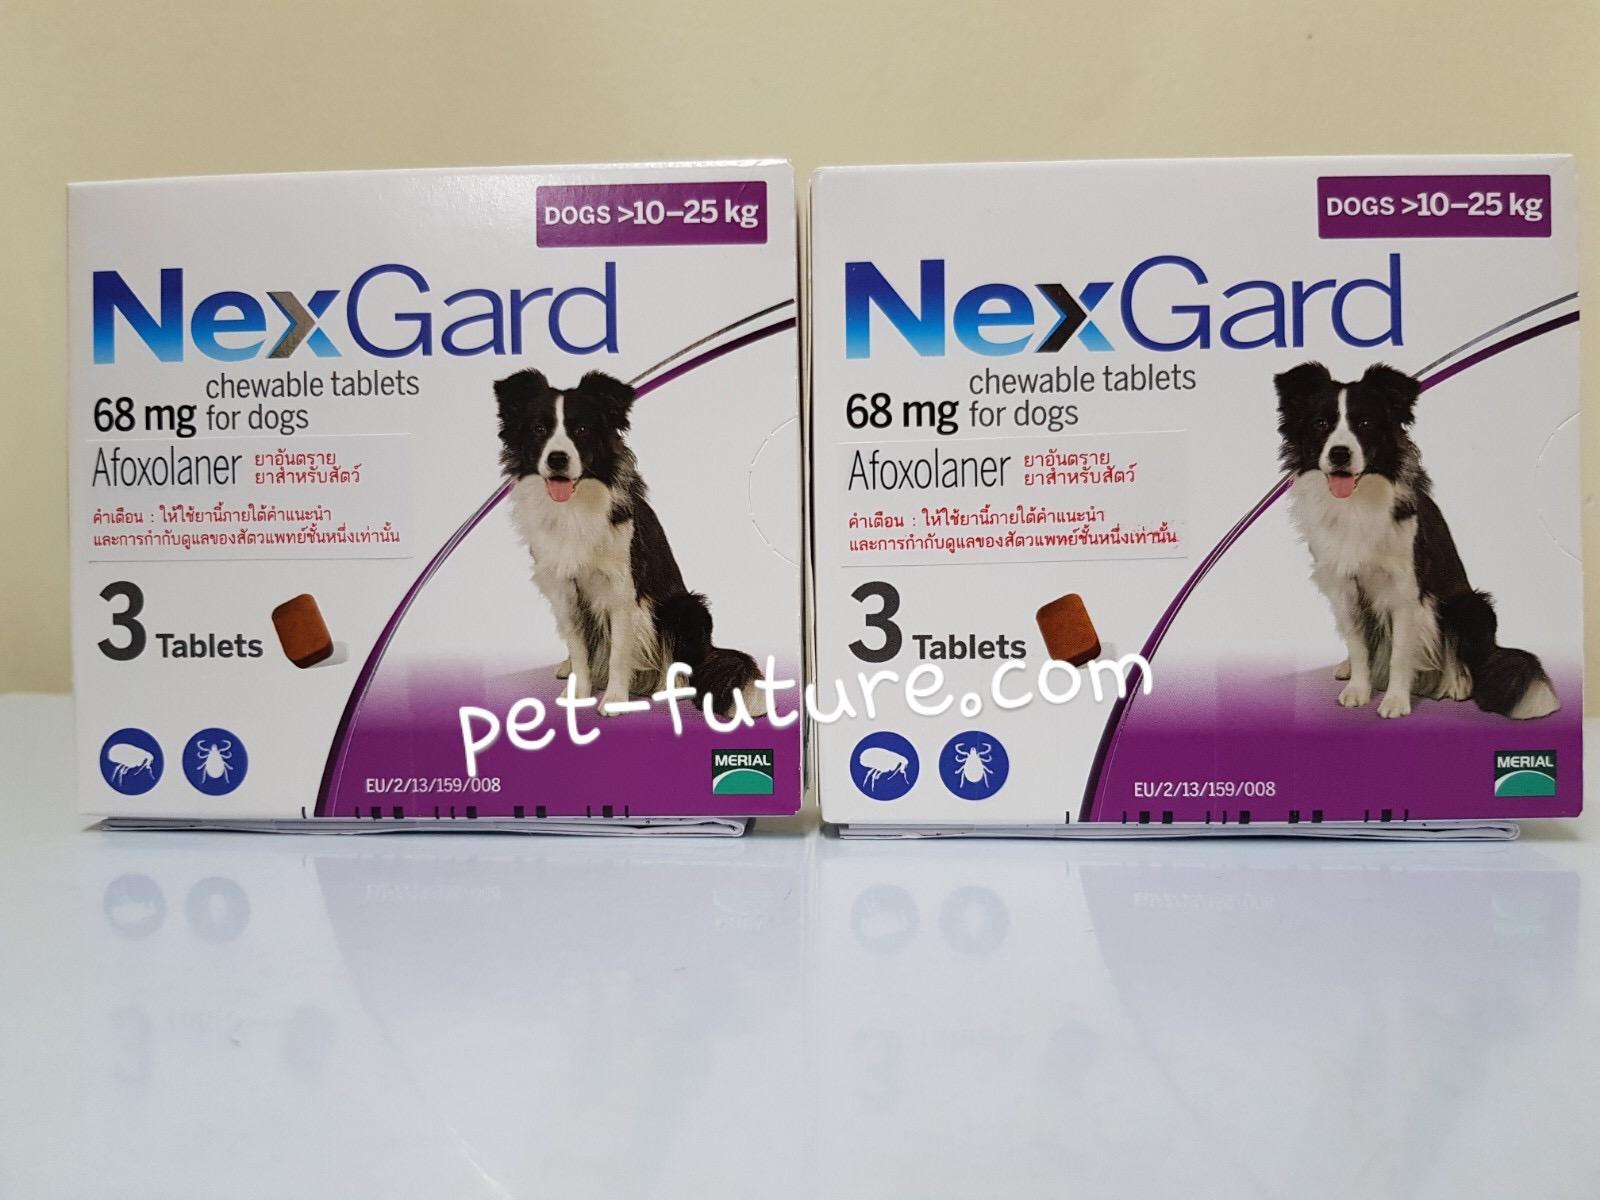 NexGard dogs 10-25 kg. Exp.10/20 จำนวน 2 กล่อง ขนาด 68 mg.